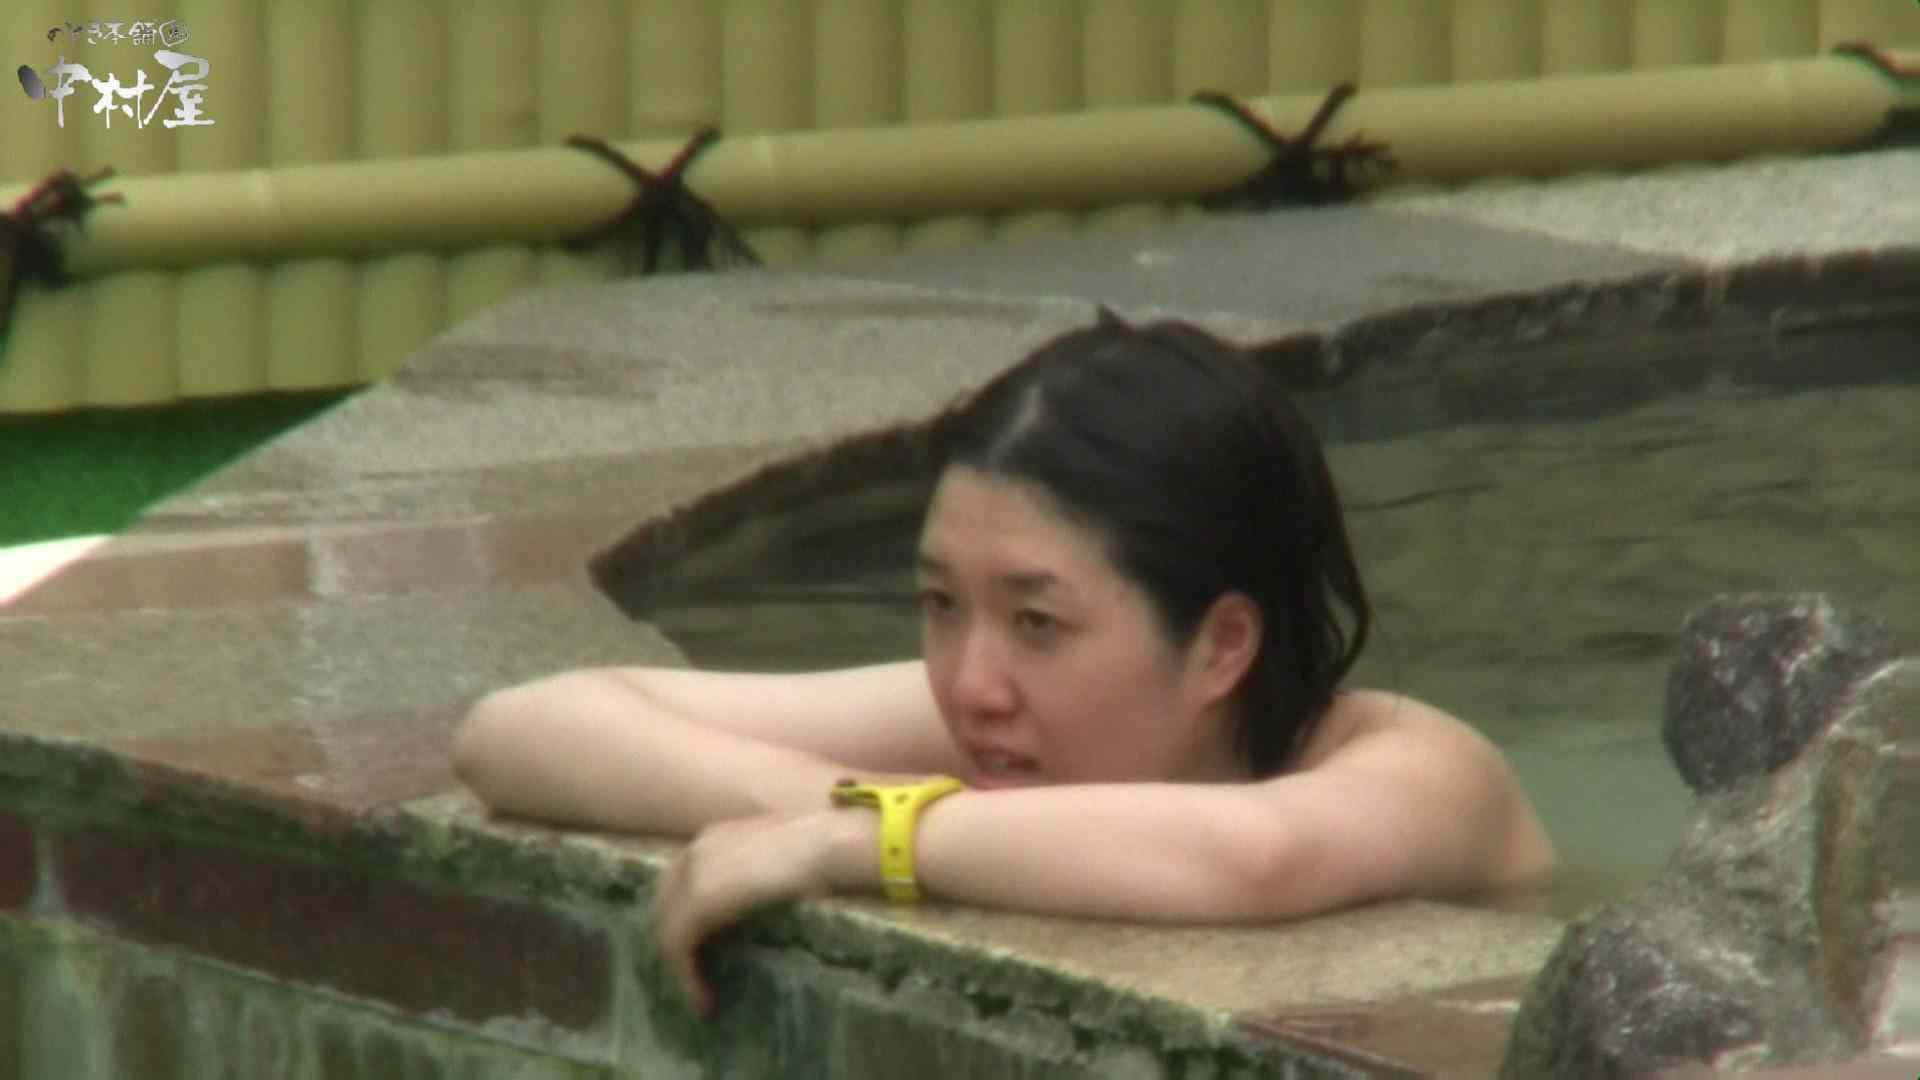 Aquaな露天風呂Vol.946 盗撮  95連発 30